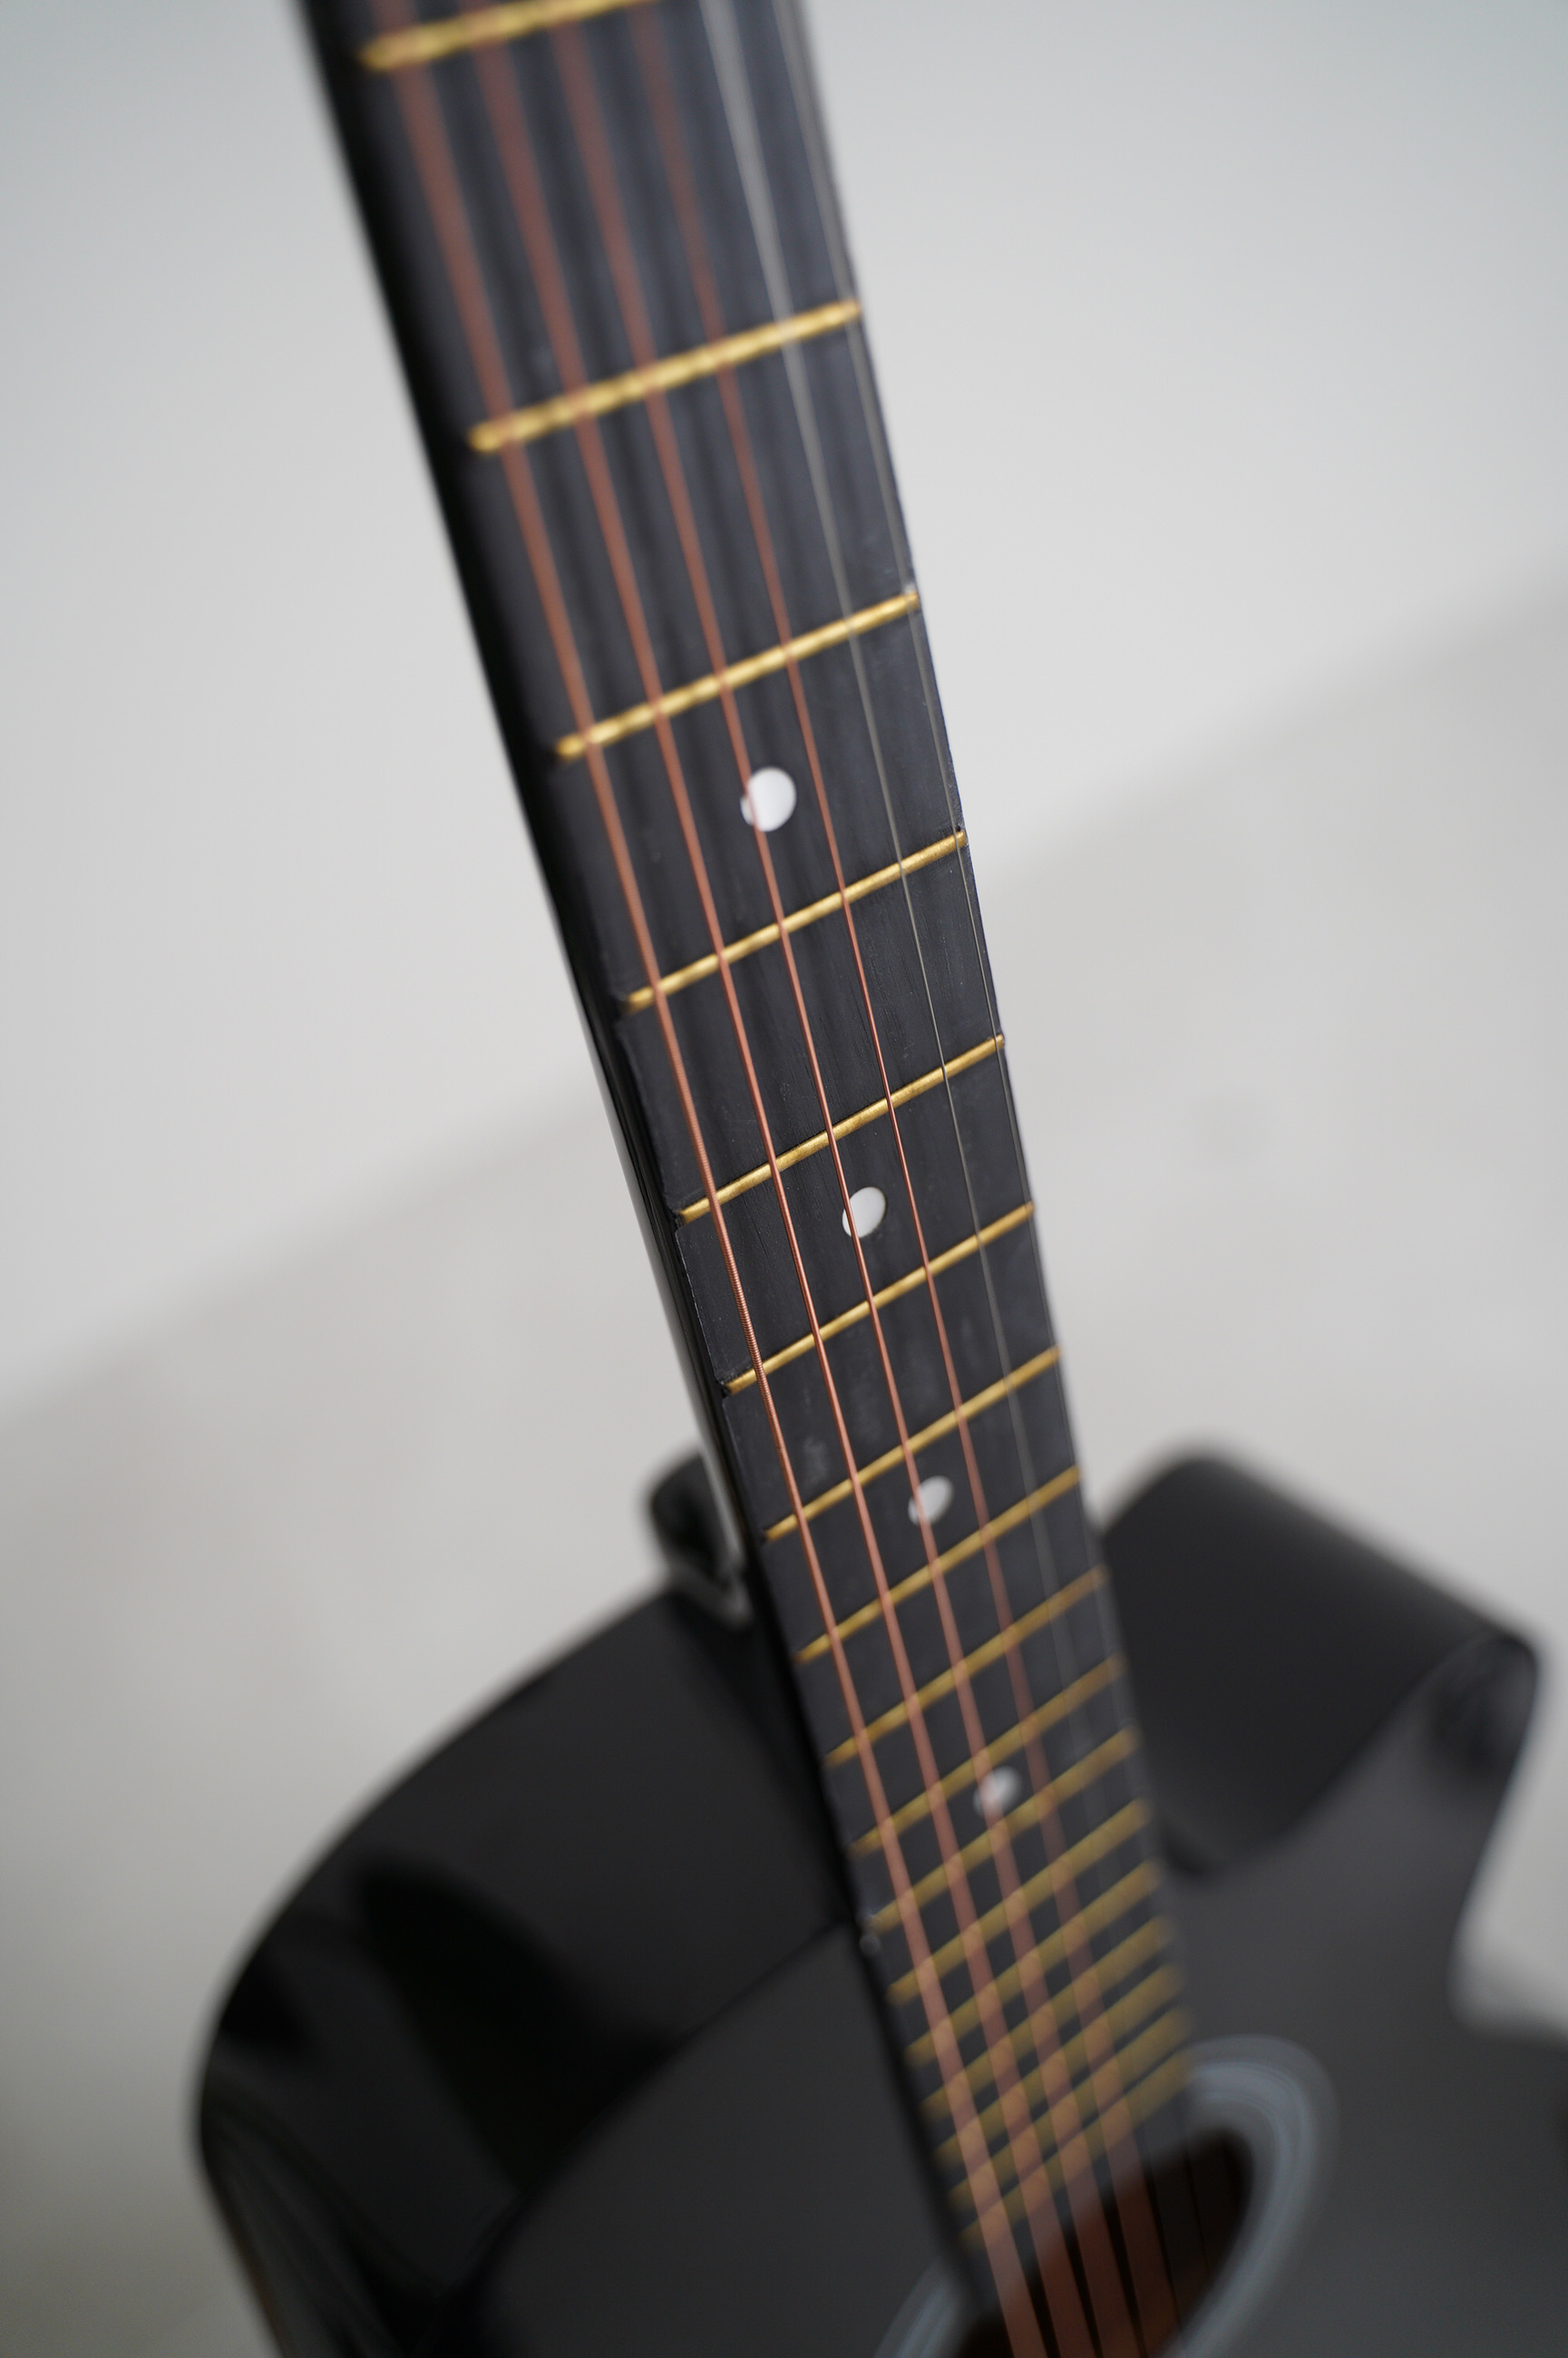 moly-ag-38-bk-acoustic-guitar-singapore-2.jpg